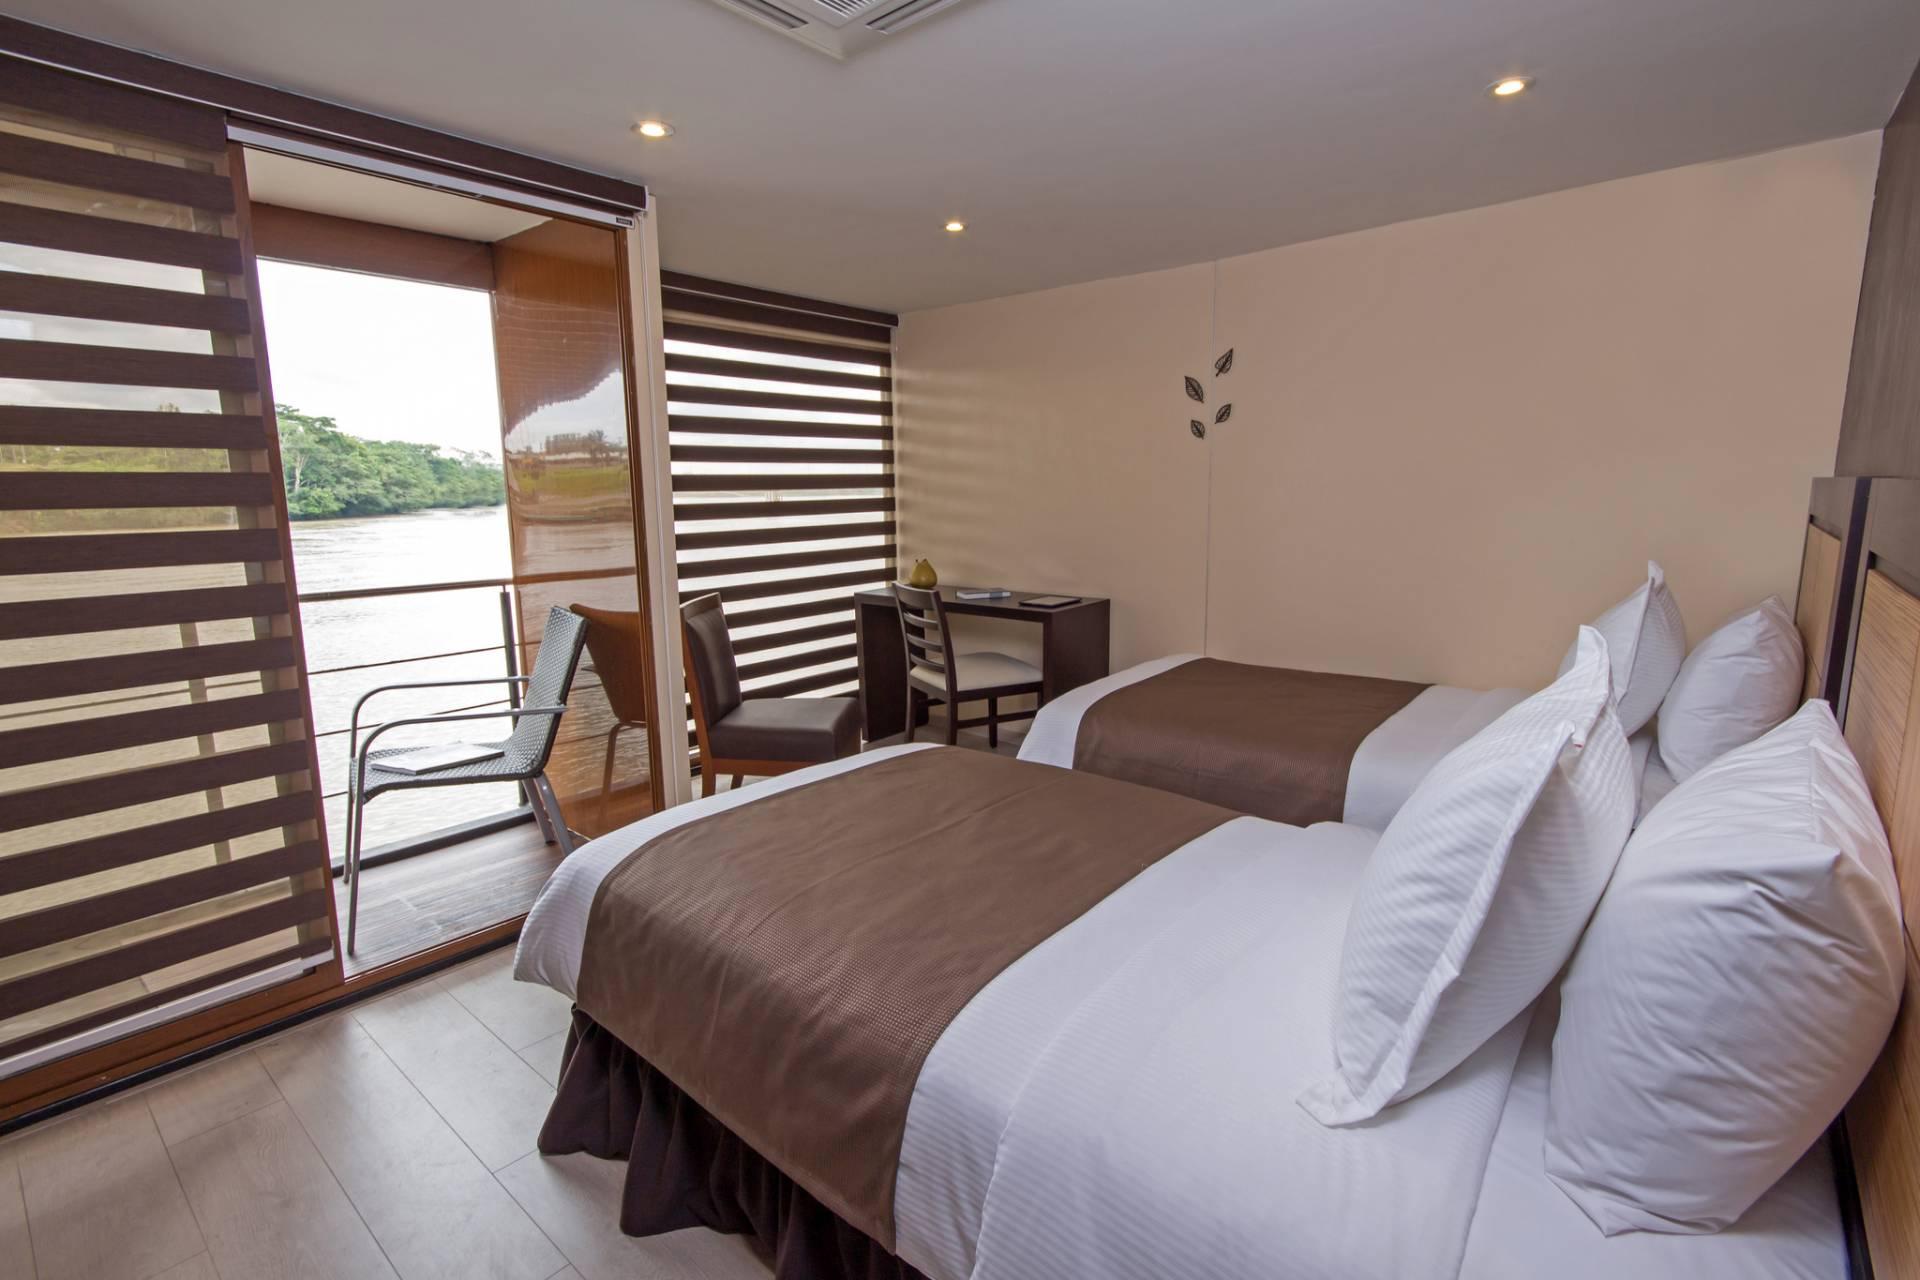 Doppelkabine auf dem Flussschiff Anakonda - Ecuador & Galapagos Luxus-Reisen